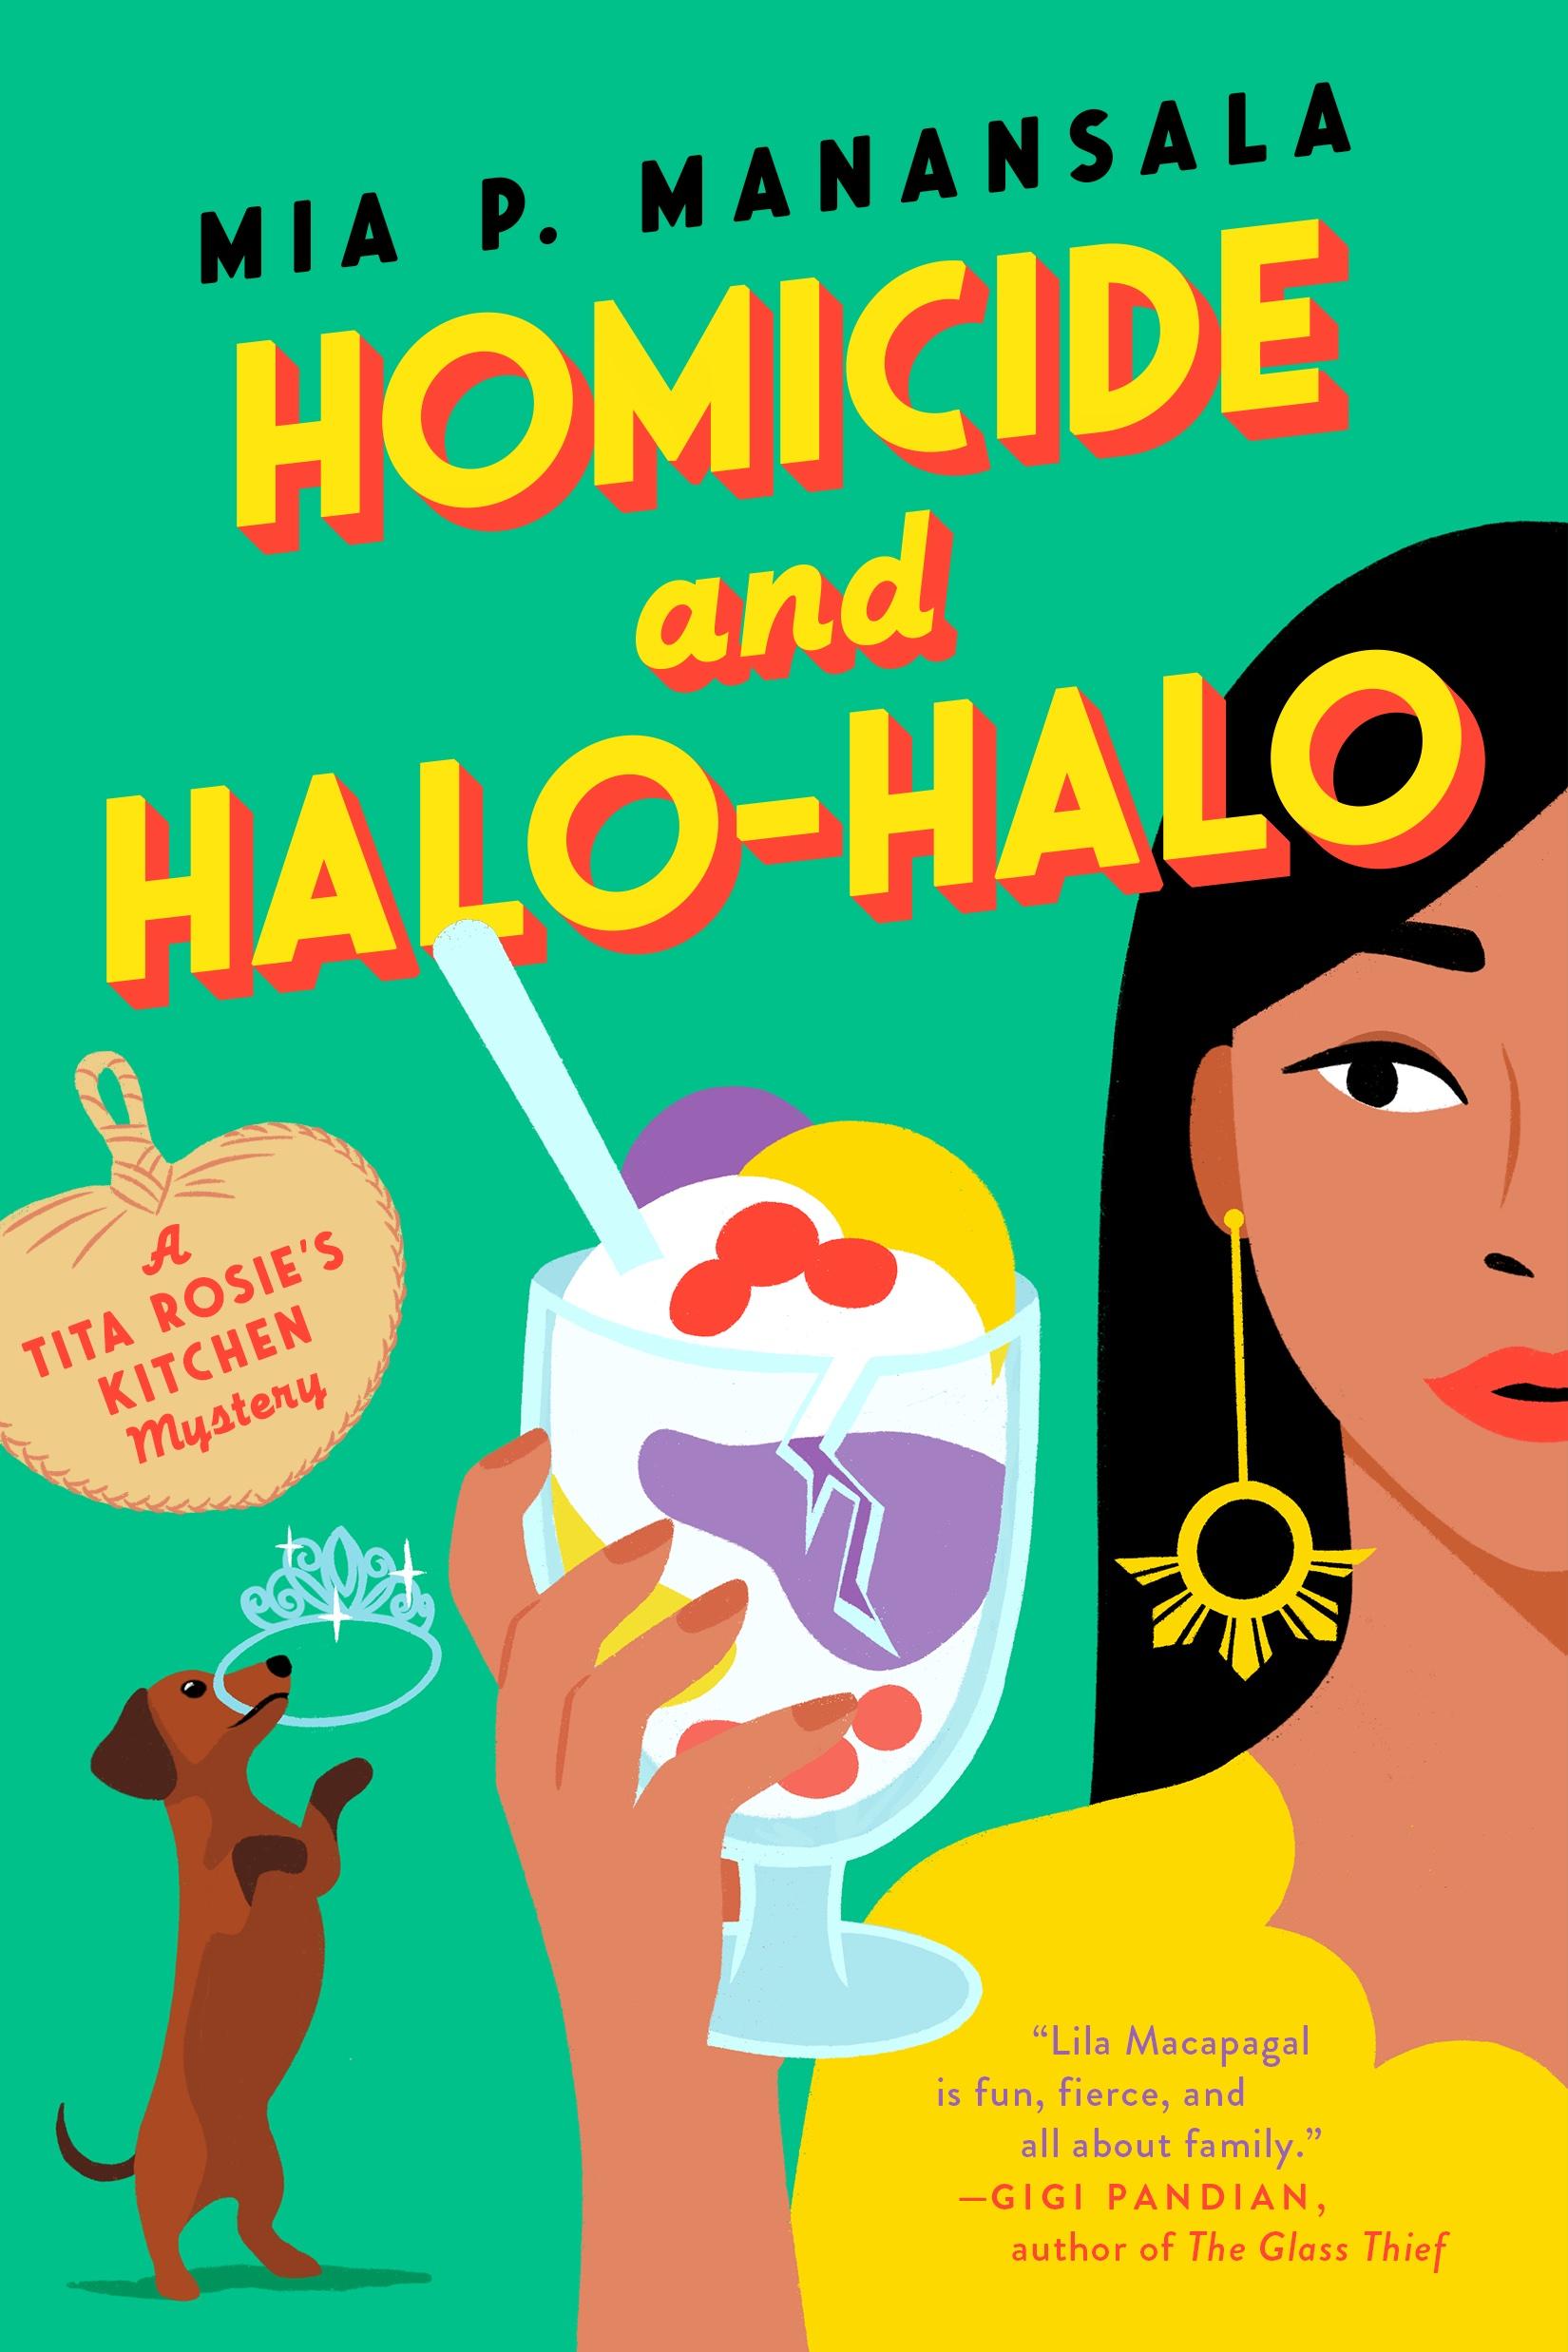 Homicide and Halo-Halo (Tita Rosie's Kitchen Mystery #2)